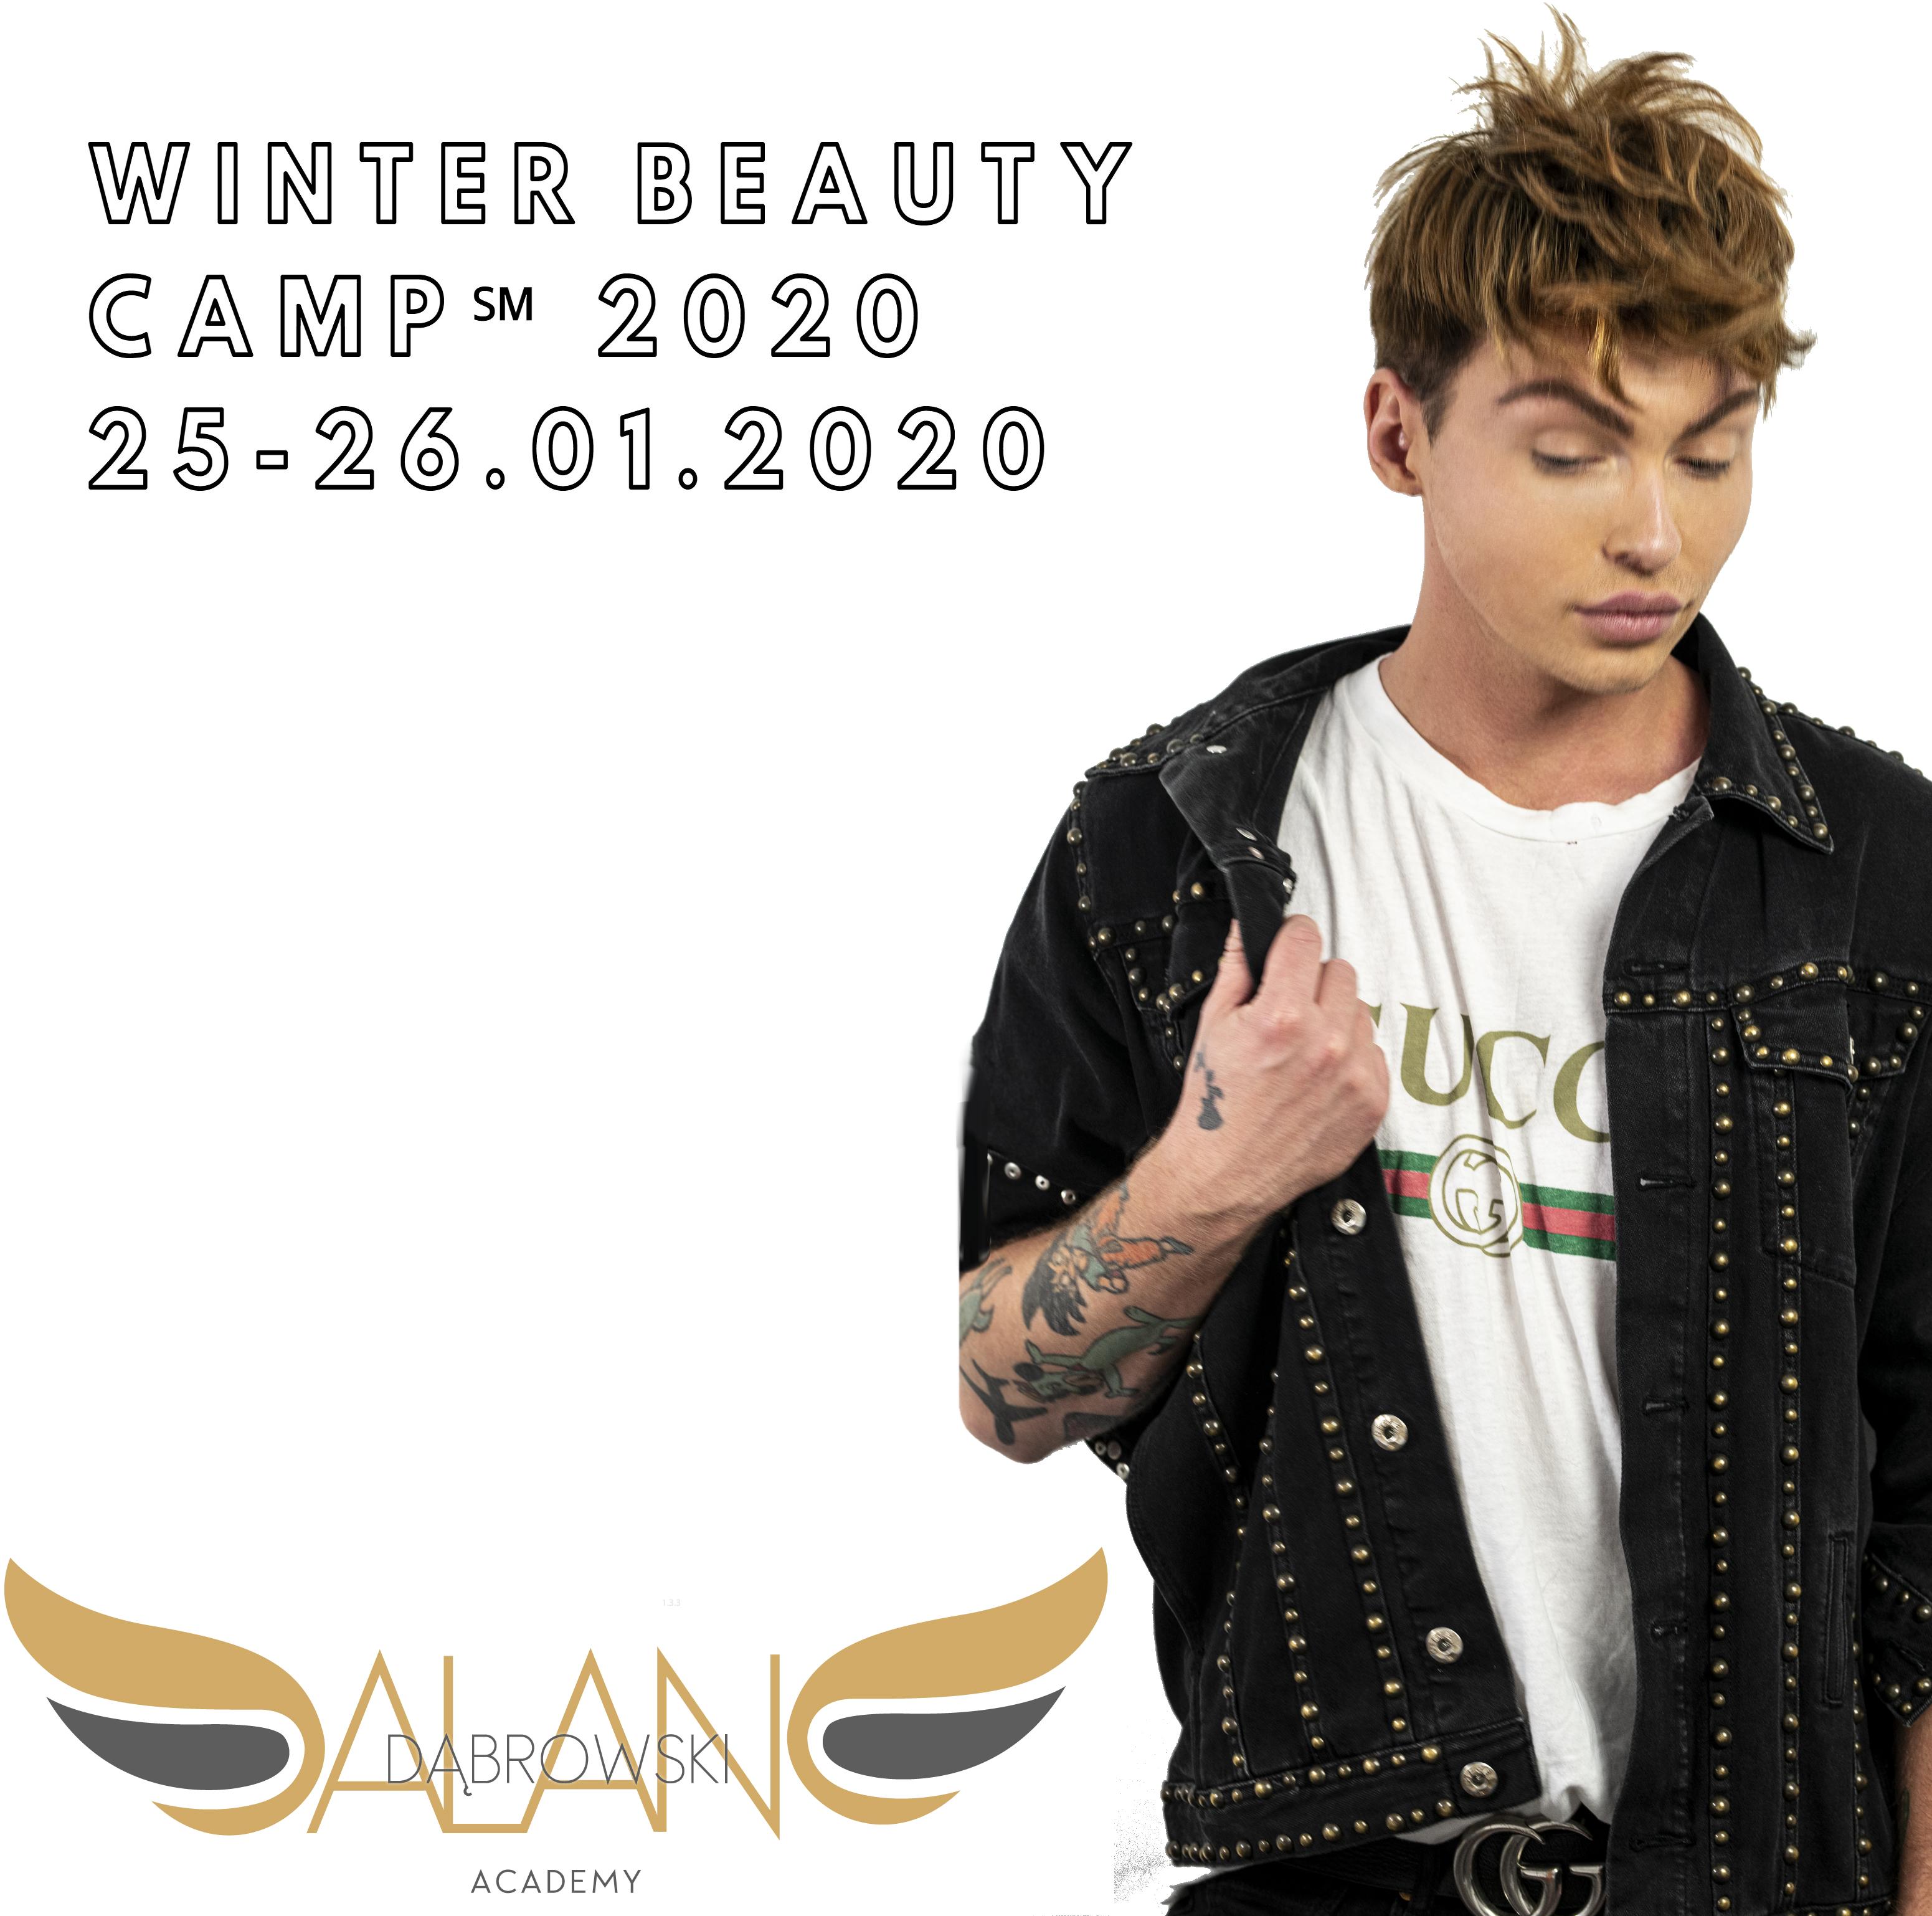 Winter Beauty Camp Tm. by Alan Dąbrowski